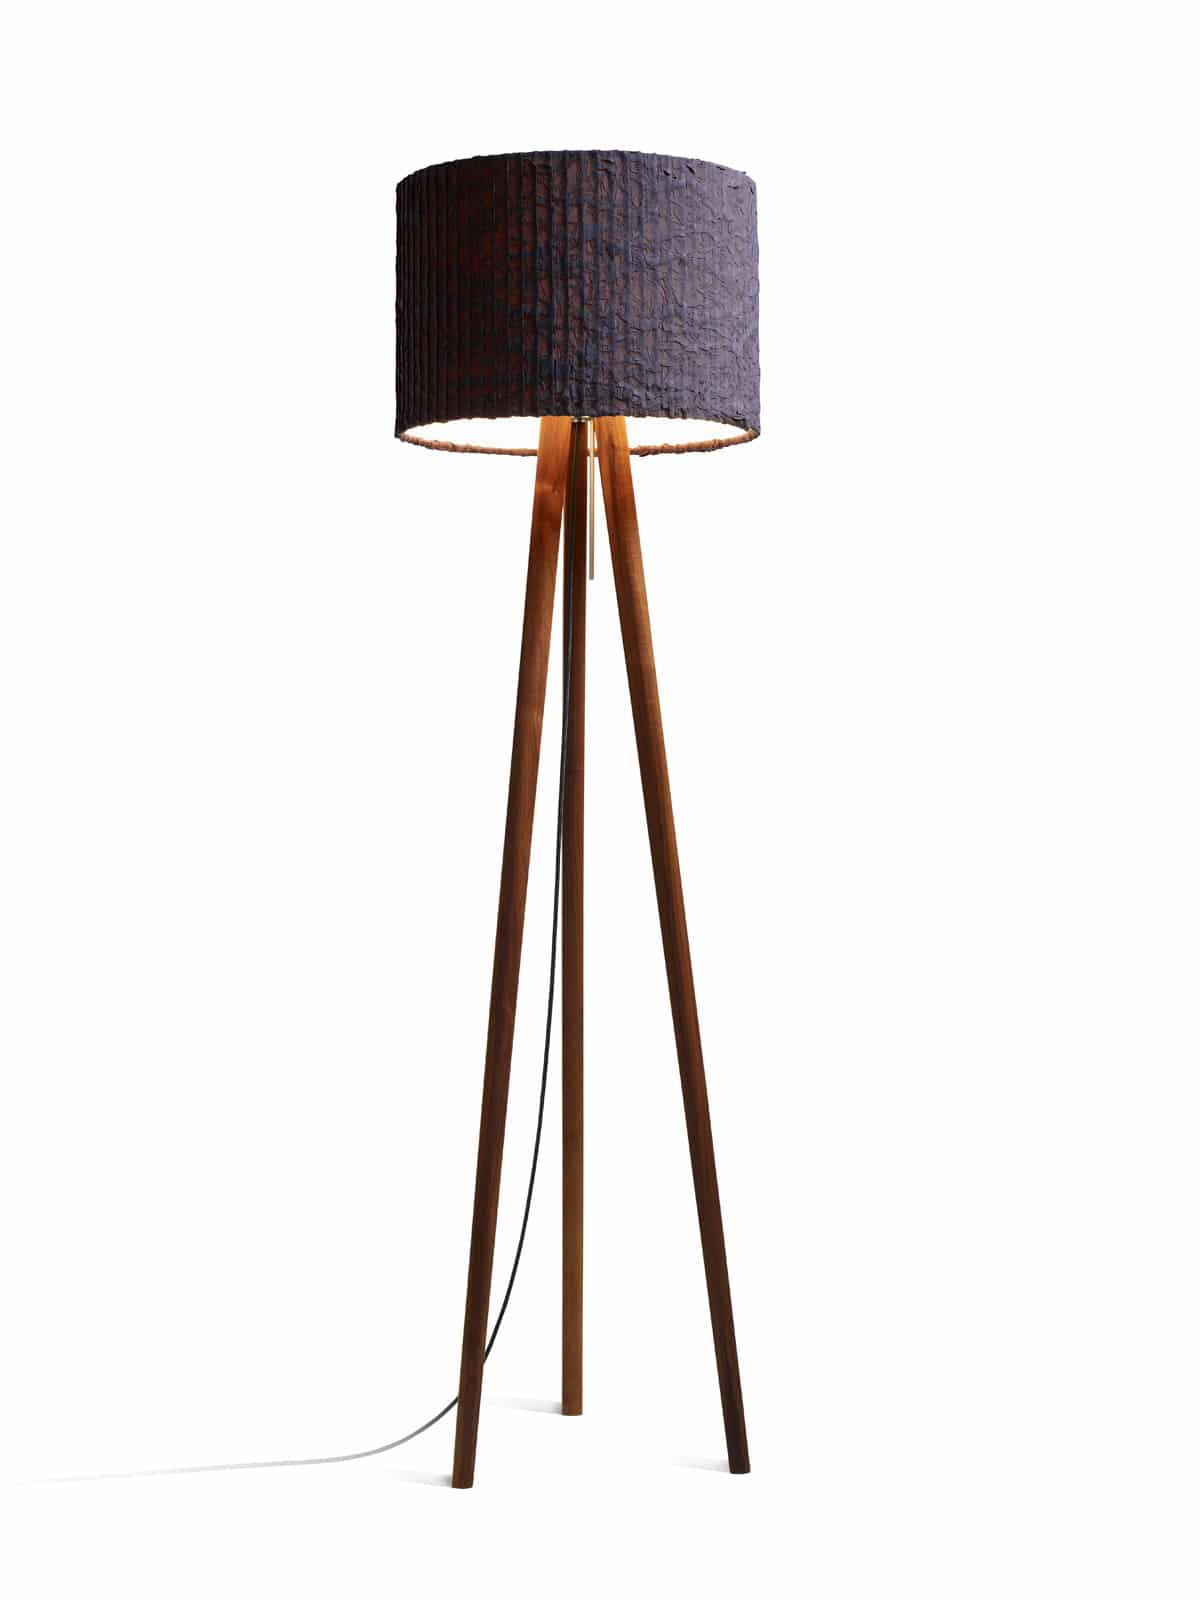 STEN CLOUD - Lampen Leuchten Designerleuchten Online Berlin Design